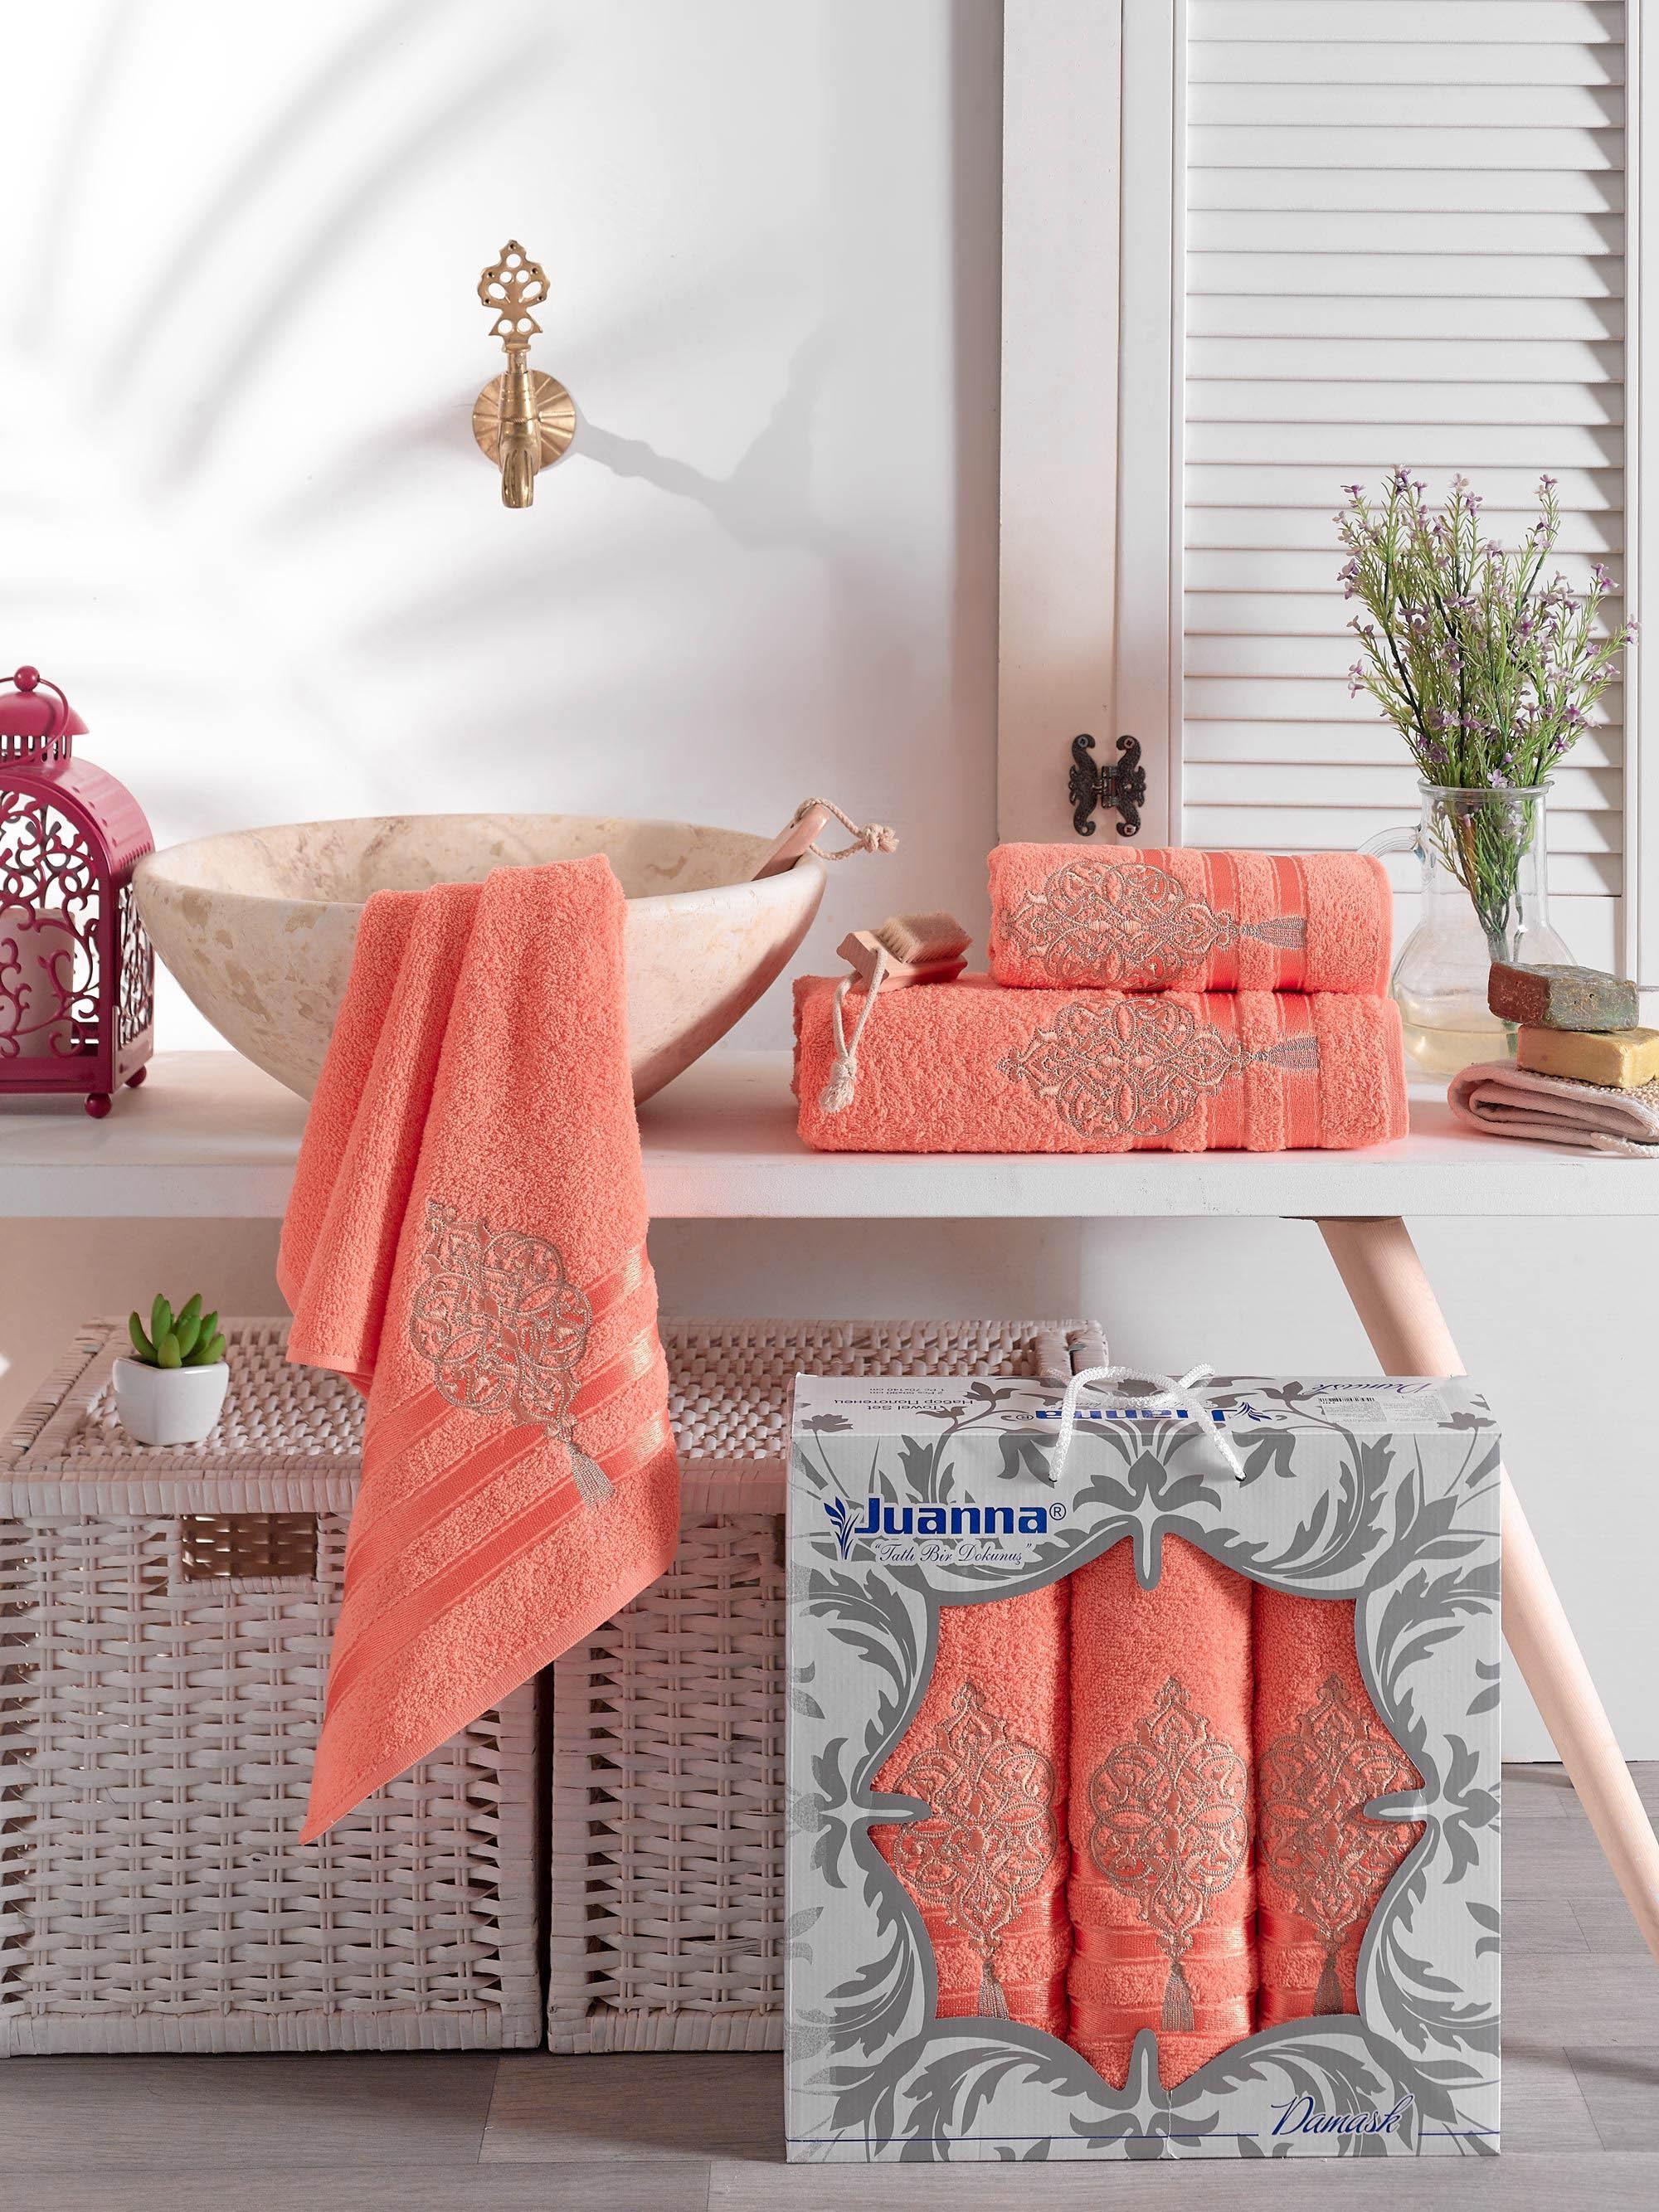 Полотенца Juanna Полотенце Damask Цвет: Оранжевый (50х90 см - 2 шт,70х140 см) набор из 3 полотенец merzuka sakura 50х90 2 70х140 8432 оранжевый